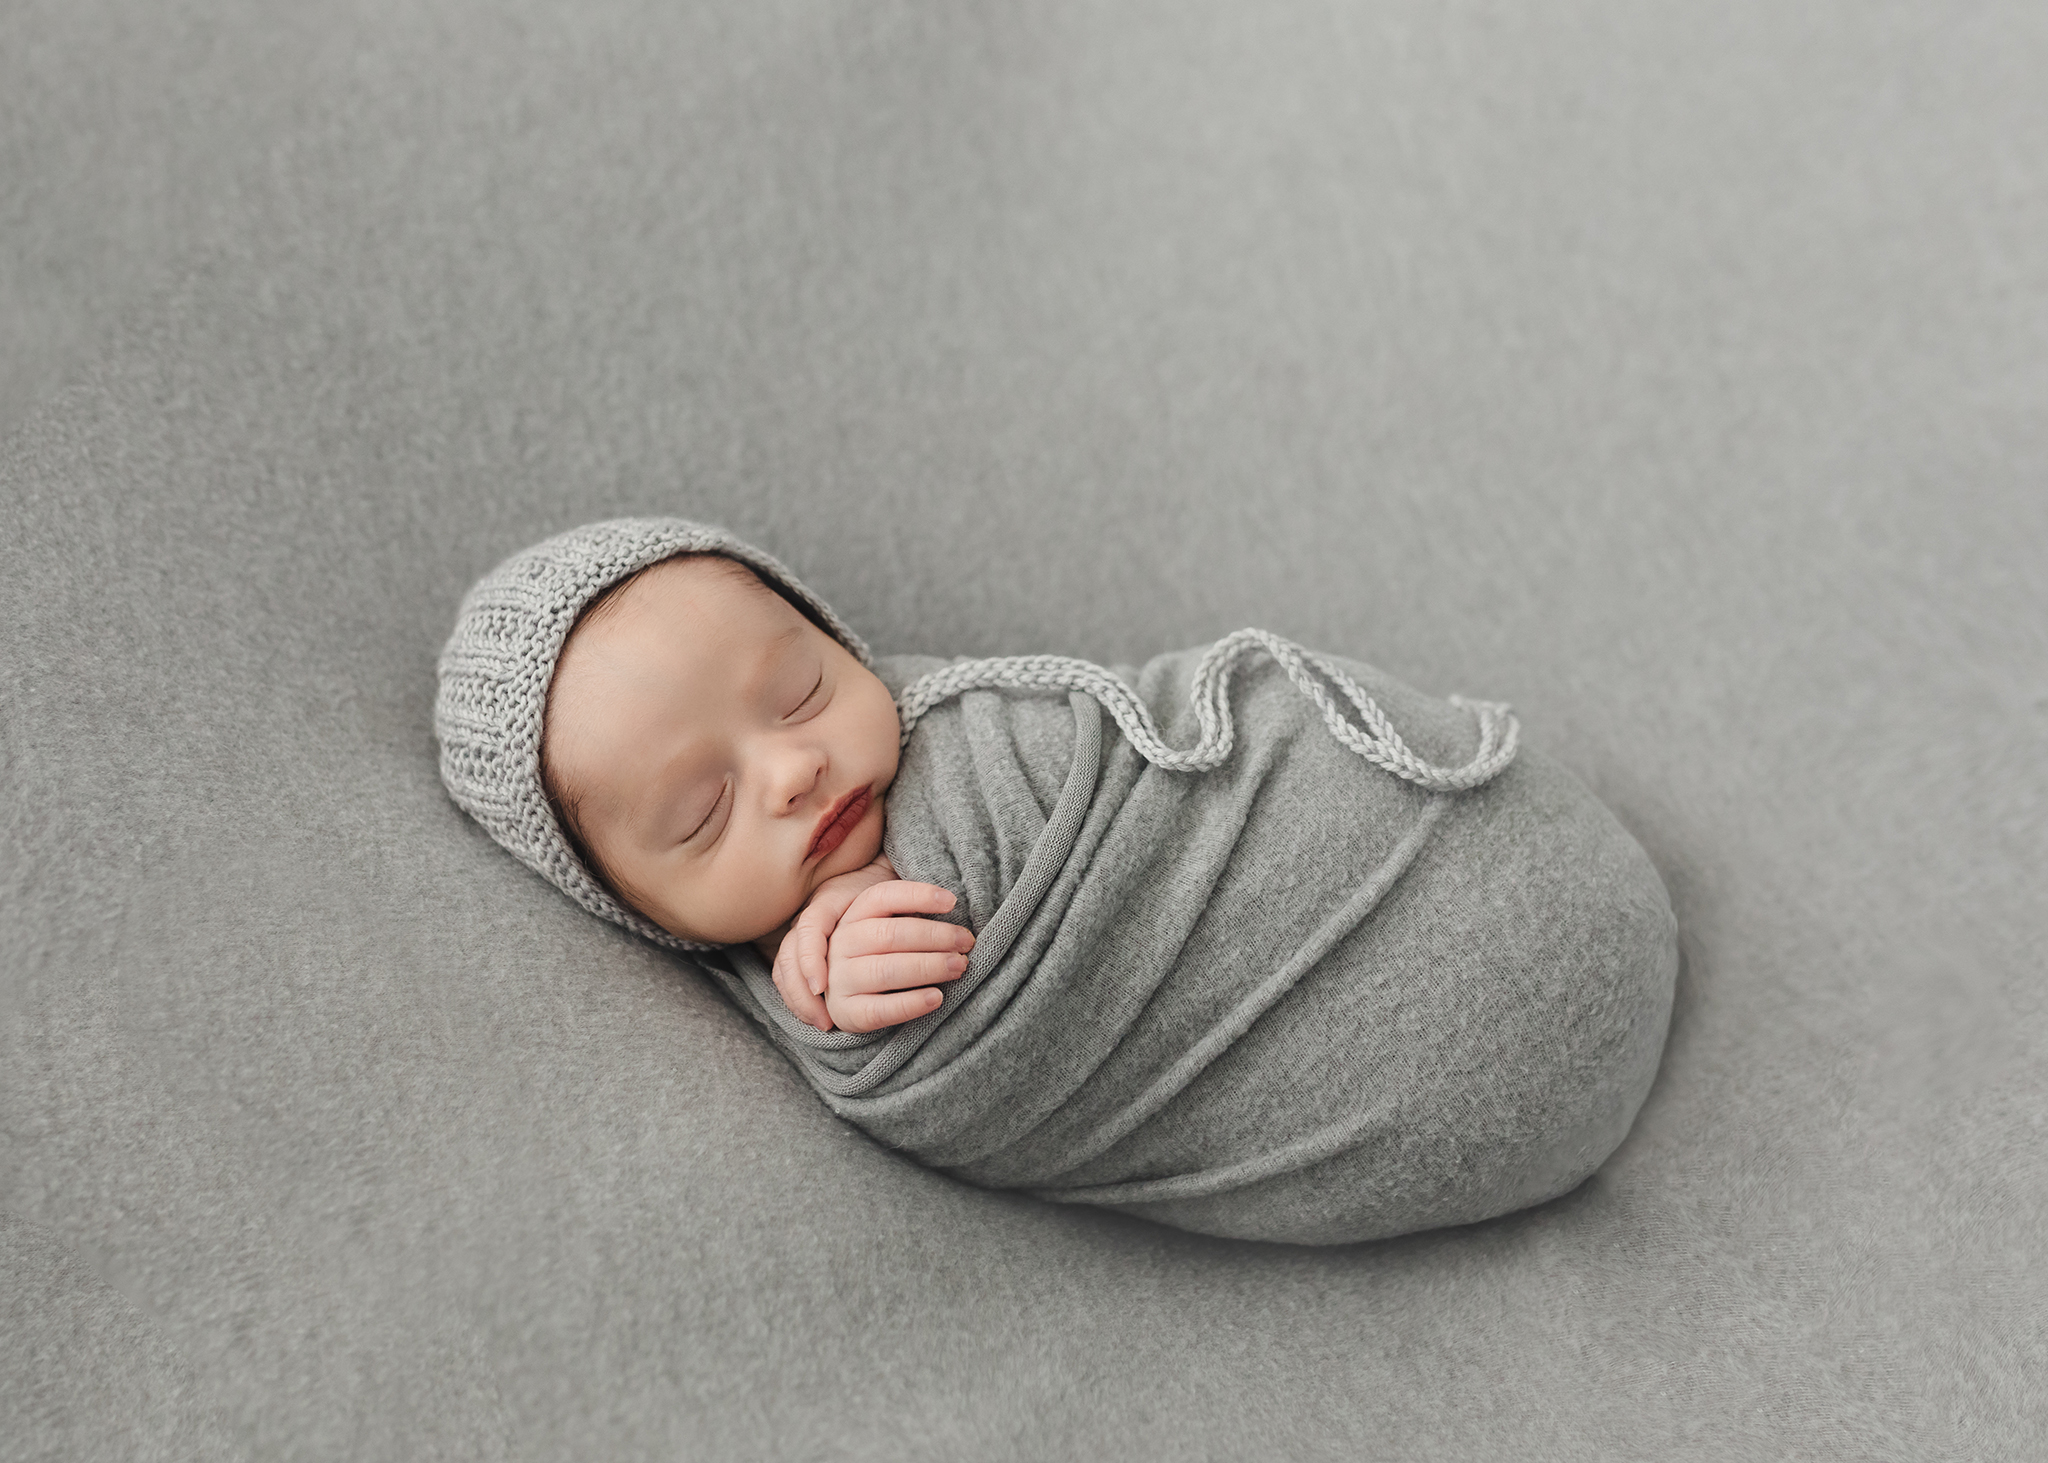 Edmonton Maternity_Fresh48_Newborn Photographer_Baby Hendrix 12.jpg